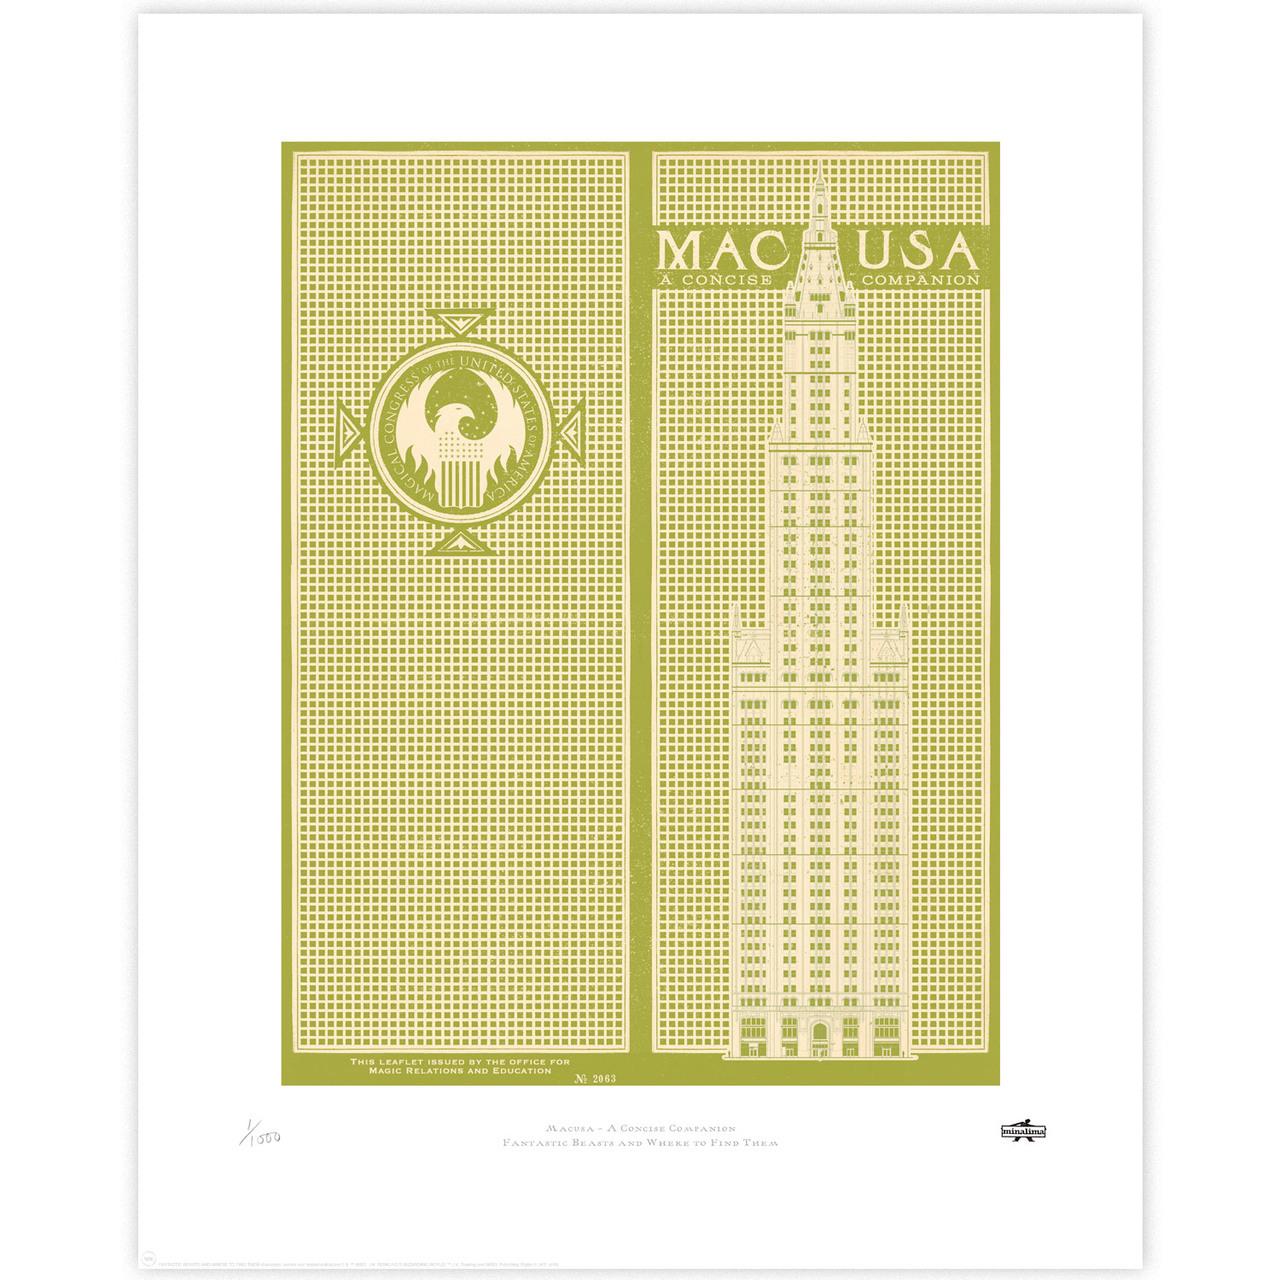 MACUSA: A Concise Companion